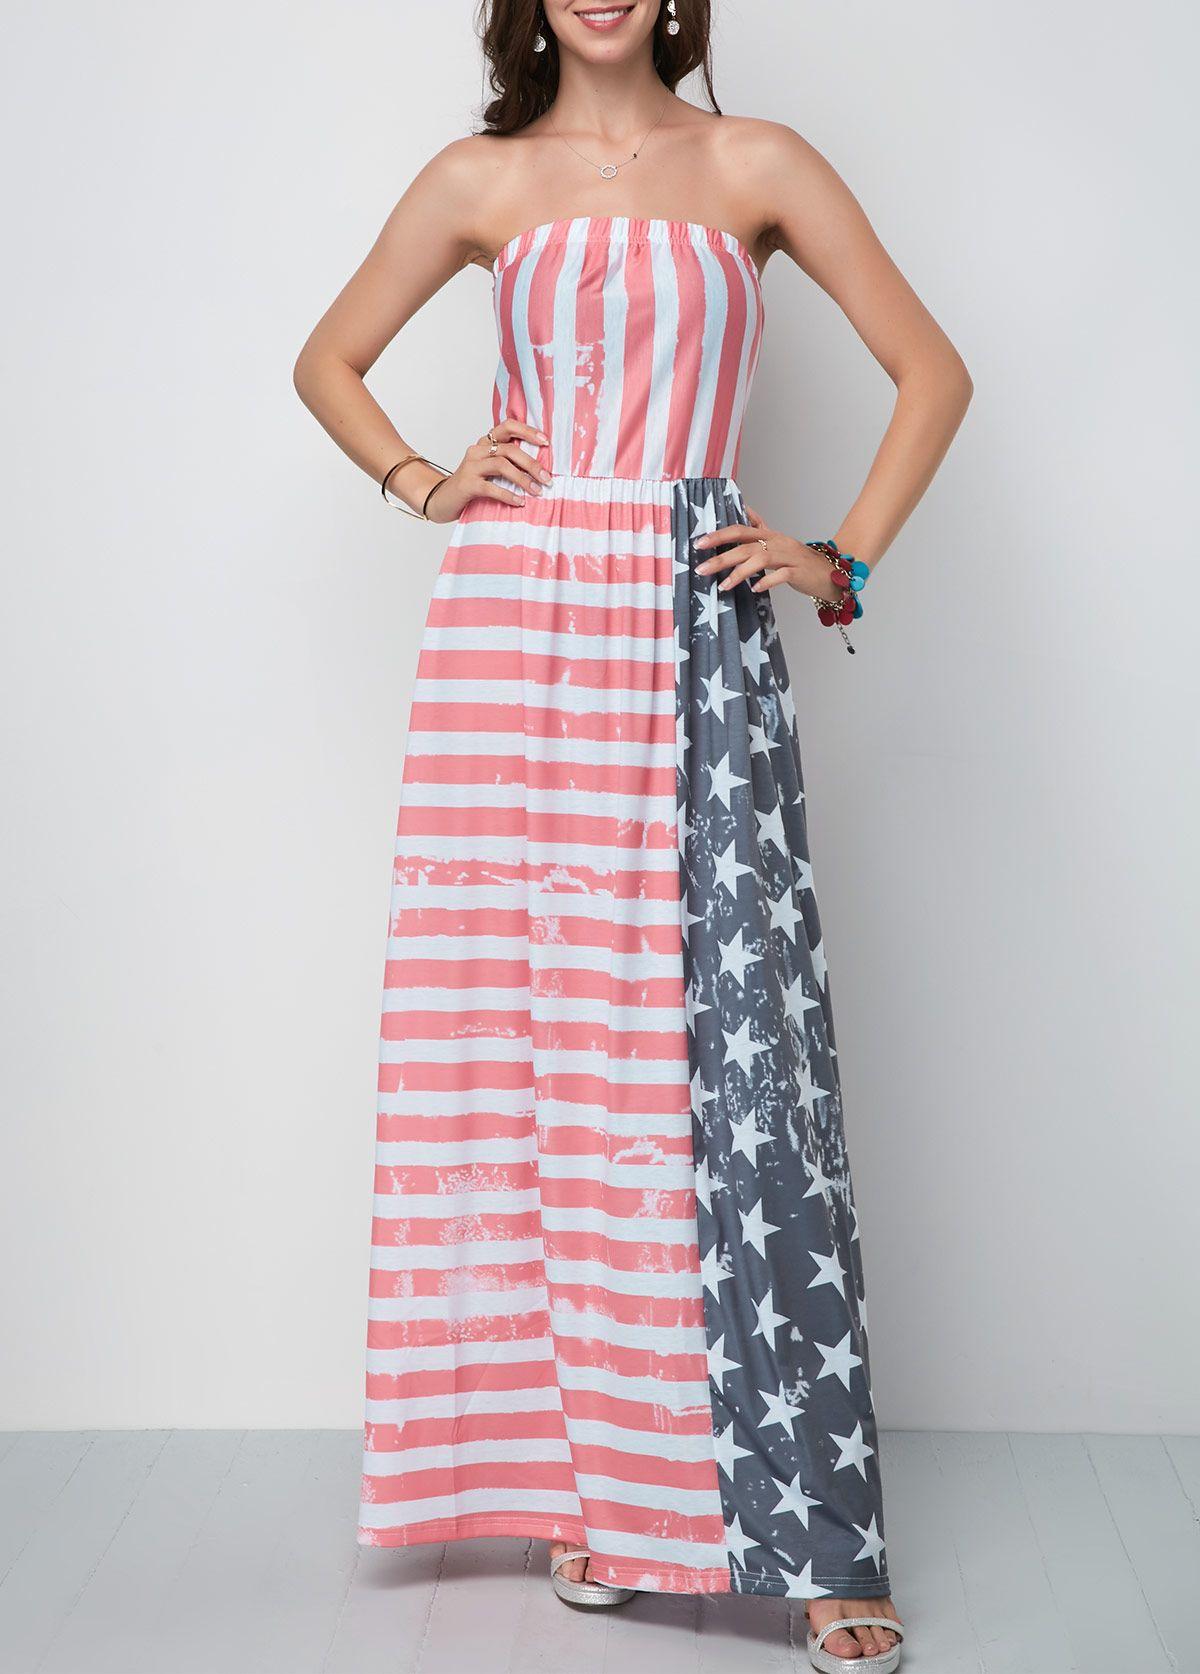 Strapless Star And Stripe Print Maxi Dress Rosewe Com Usd 28 99 Tube Maxi Dresses Maxi Dress Sale Maxi Dress With Sleeves [ 1674 x 1200 Pixel ]